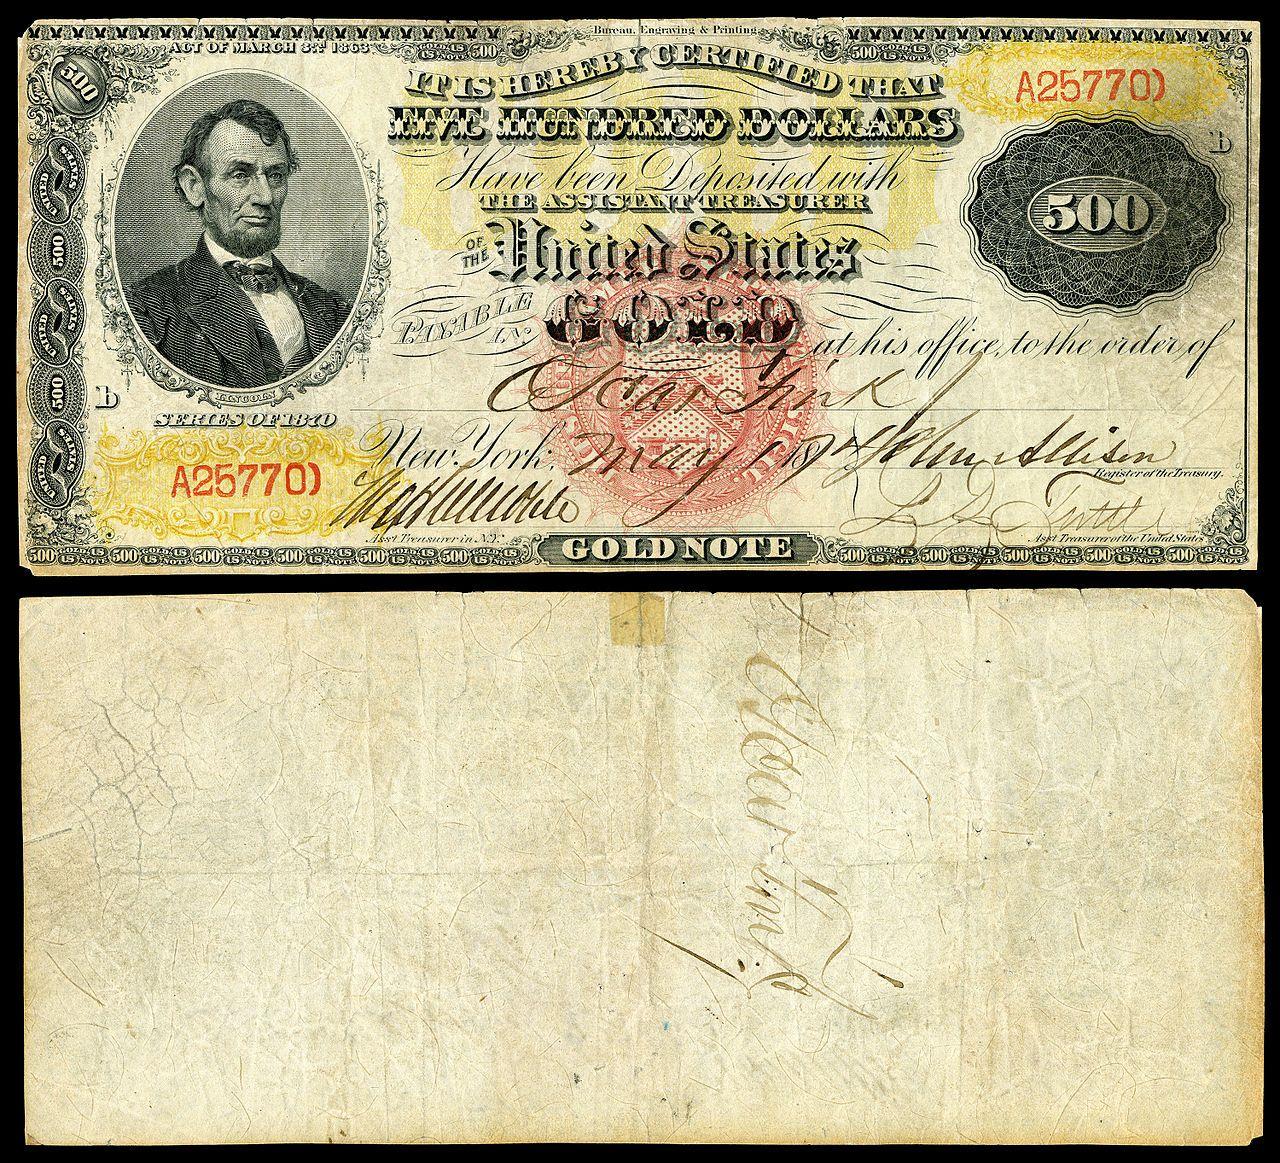 500 gold certificate series 1870 fr 1166i depicting abraham